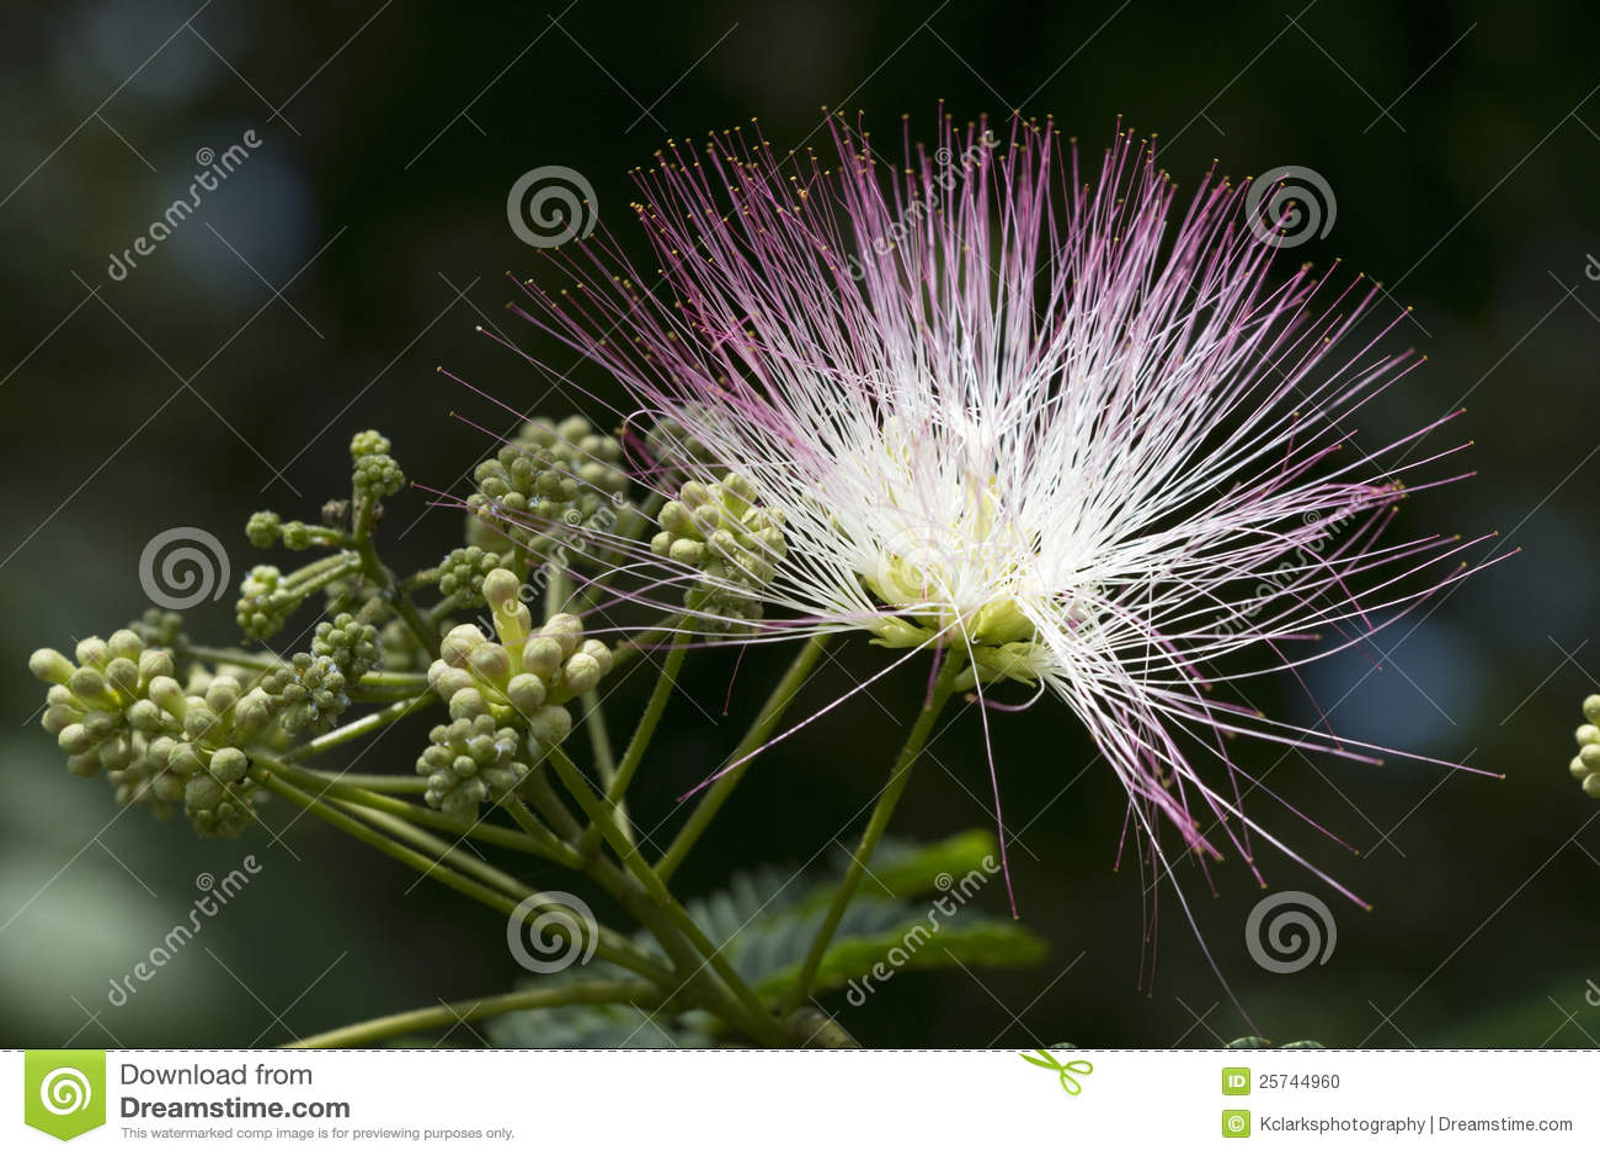 Alabama Silk Mimosa Tree Blossom Stock Photo Image Of Pink Silk